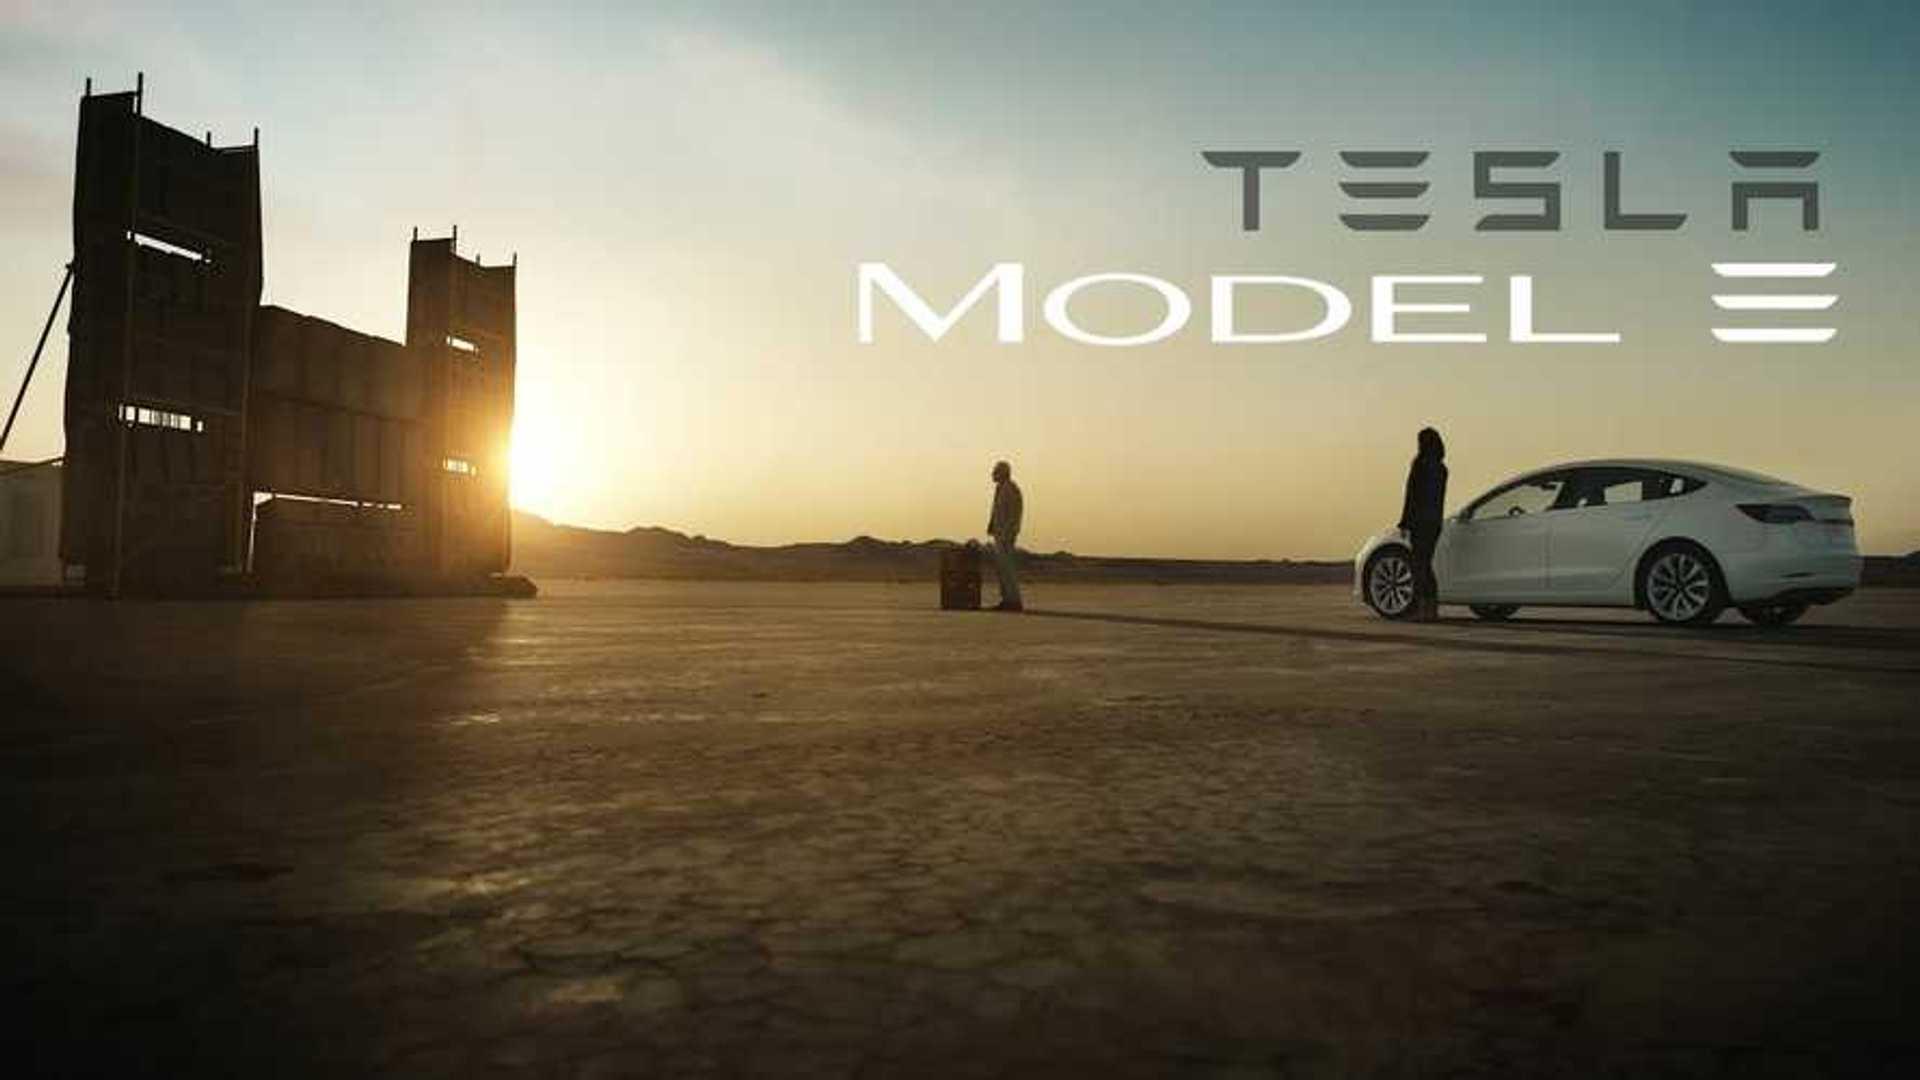 Fan-Made Tesla Model 3 Commercial Makes You Feel Its Soul